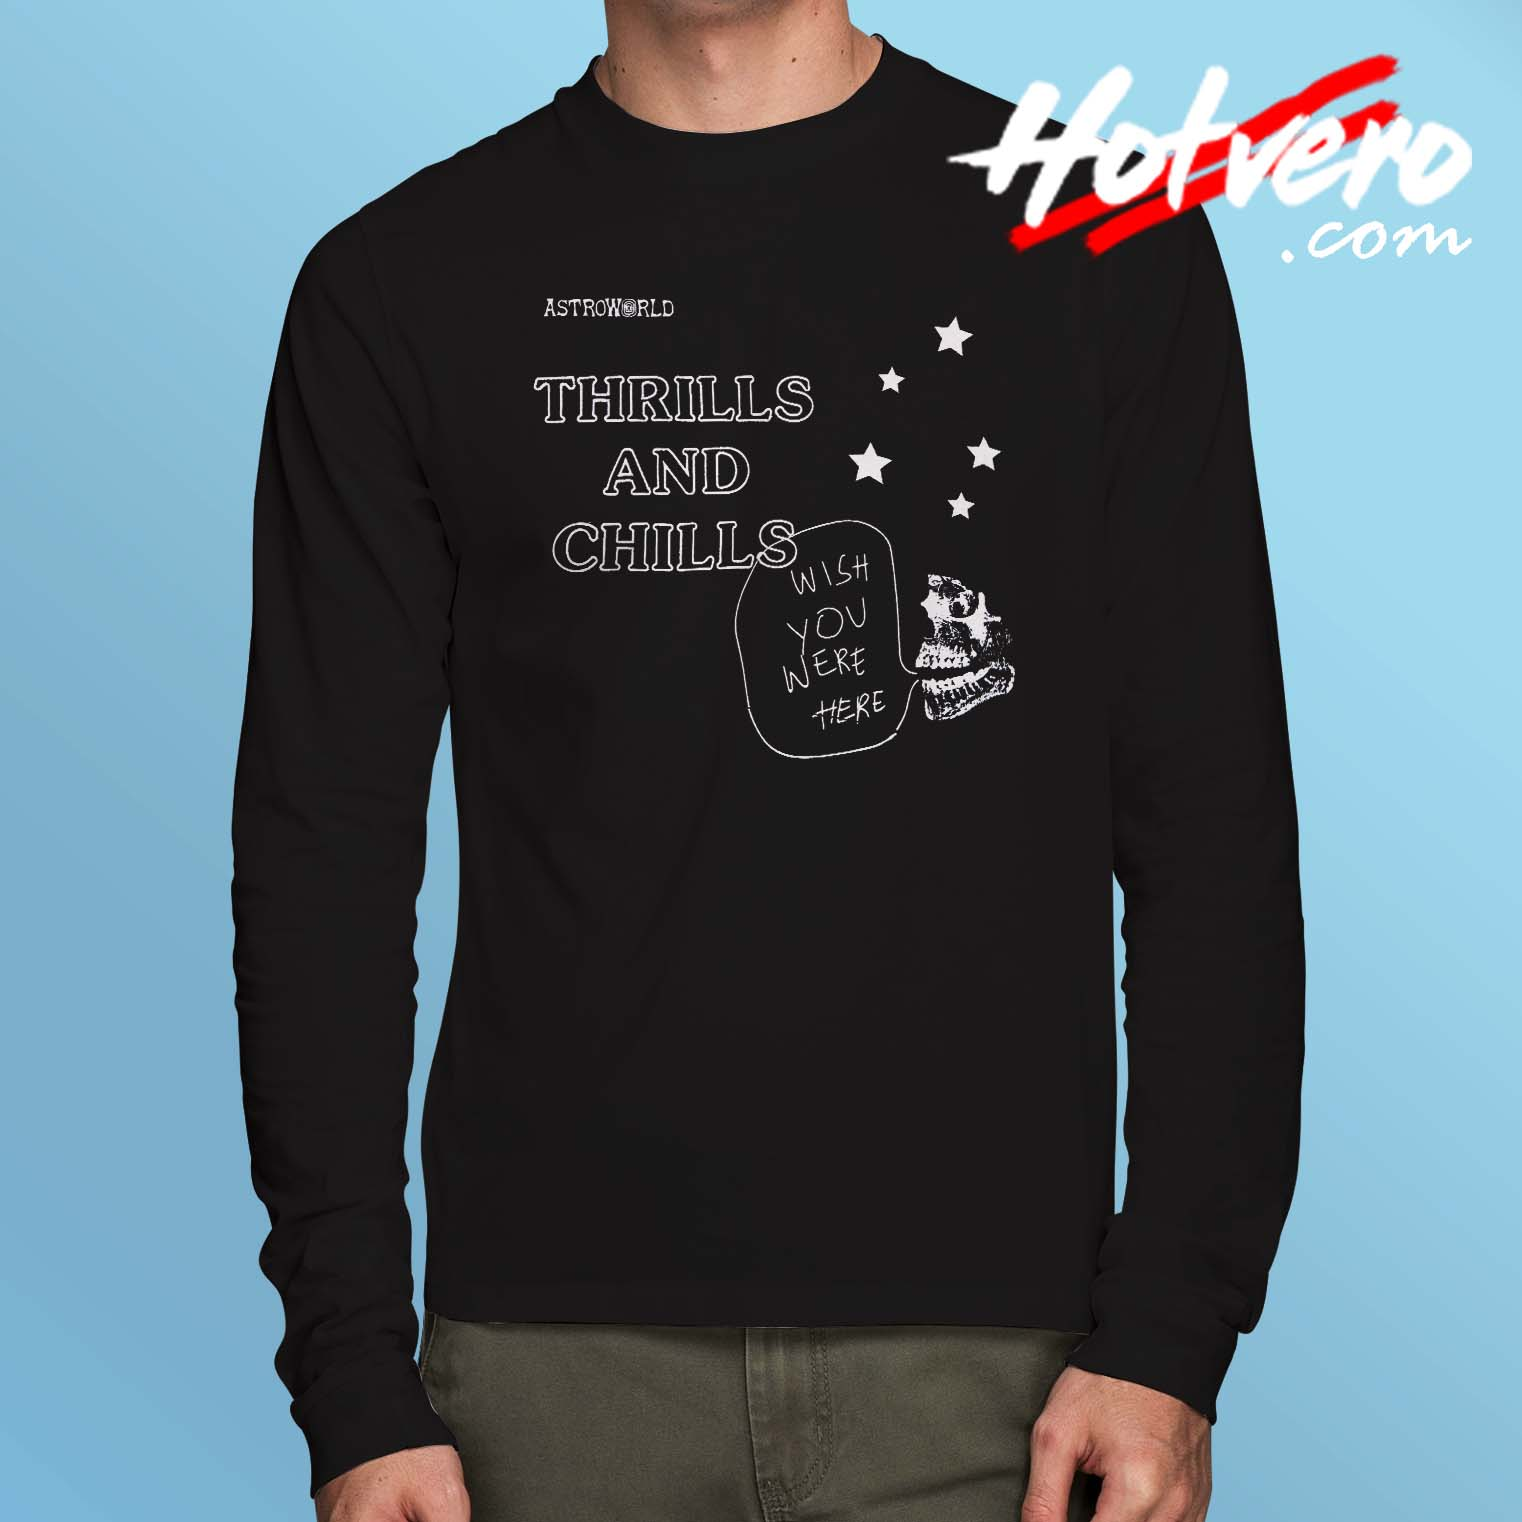 3208ac586a92 Travis Scott Astroworld Thrills Chills Long Sleeve T Shirt - Hotvero.com